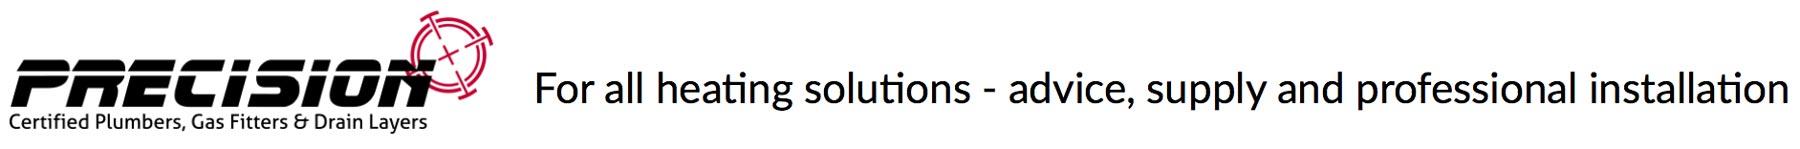 Precision Group Ltd Retina Logo